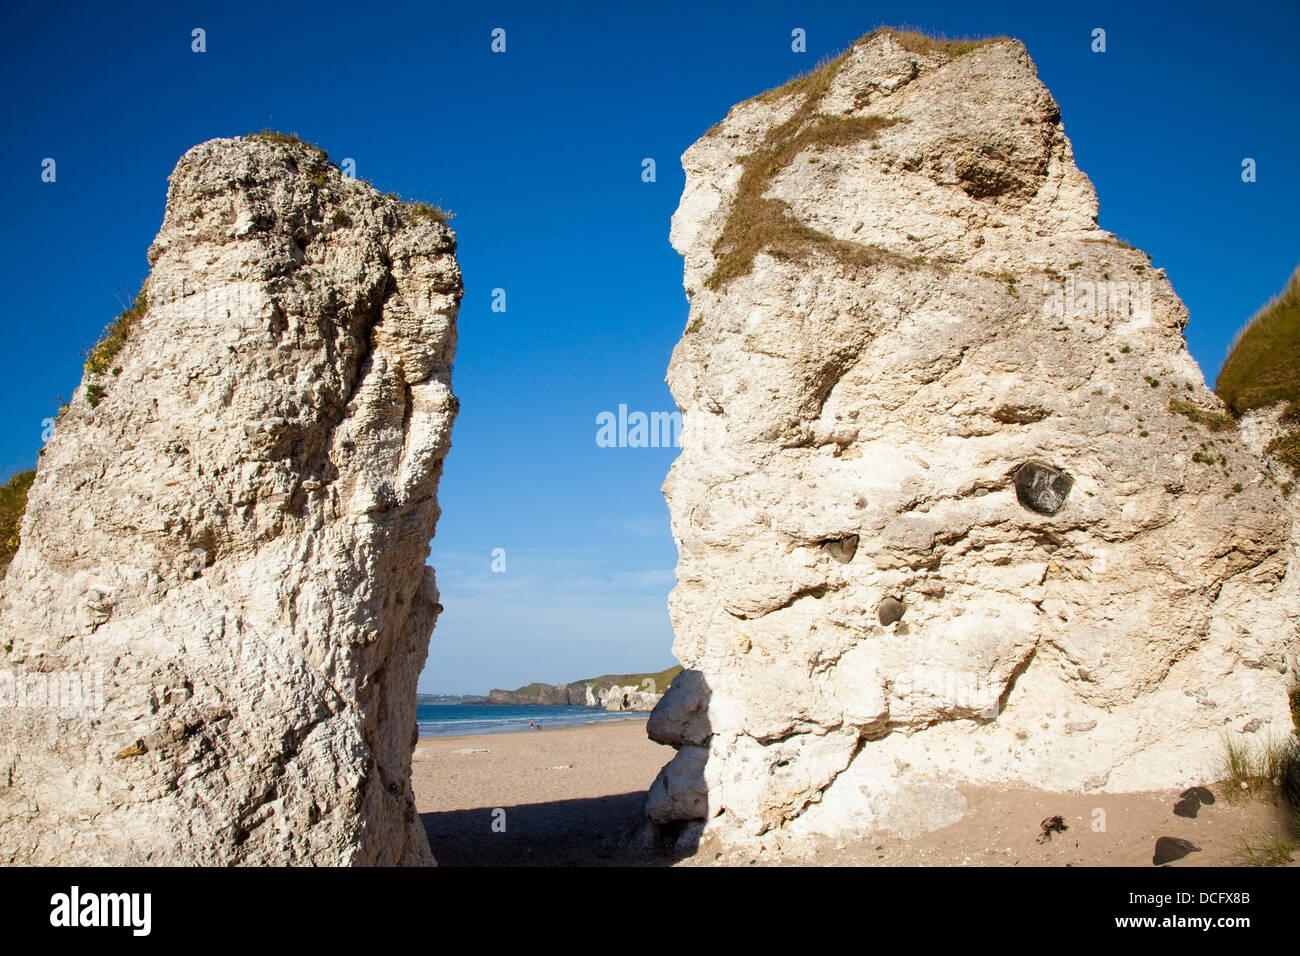 Landmark Rock Formations On Beach; White Rocks Beach, Portrush, Country Antrim, Northern Ireland Stock Photo